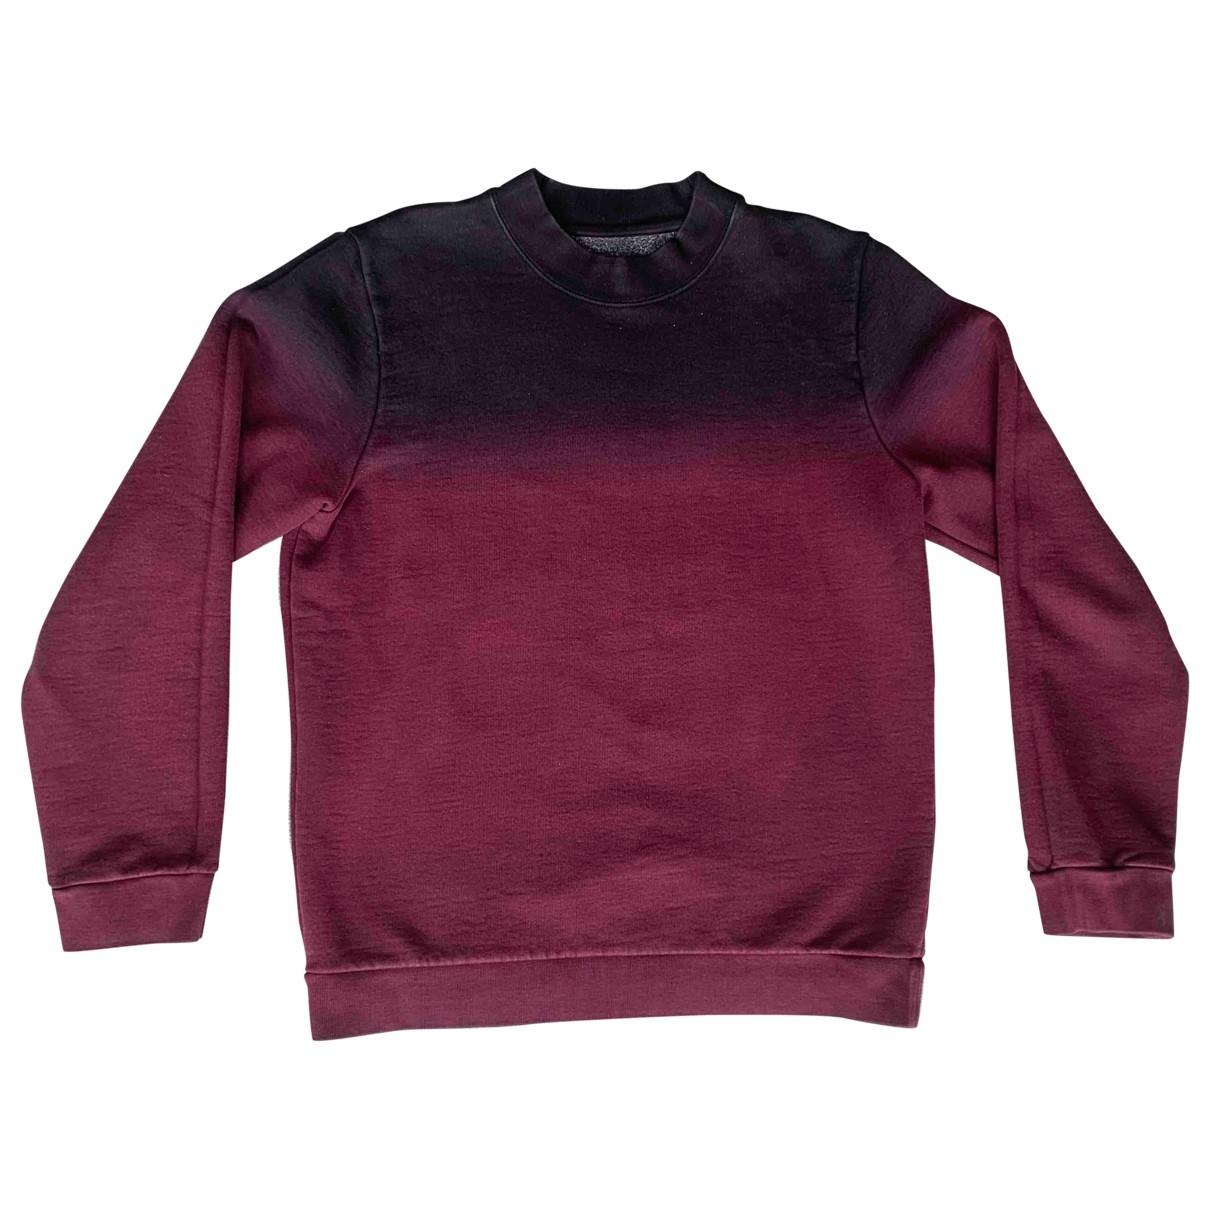 Raf Simons \N Burgundy Cotton Knitwear & Sweatshirts for Men M International